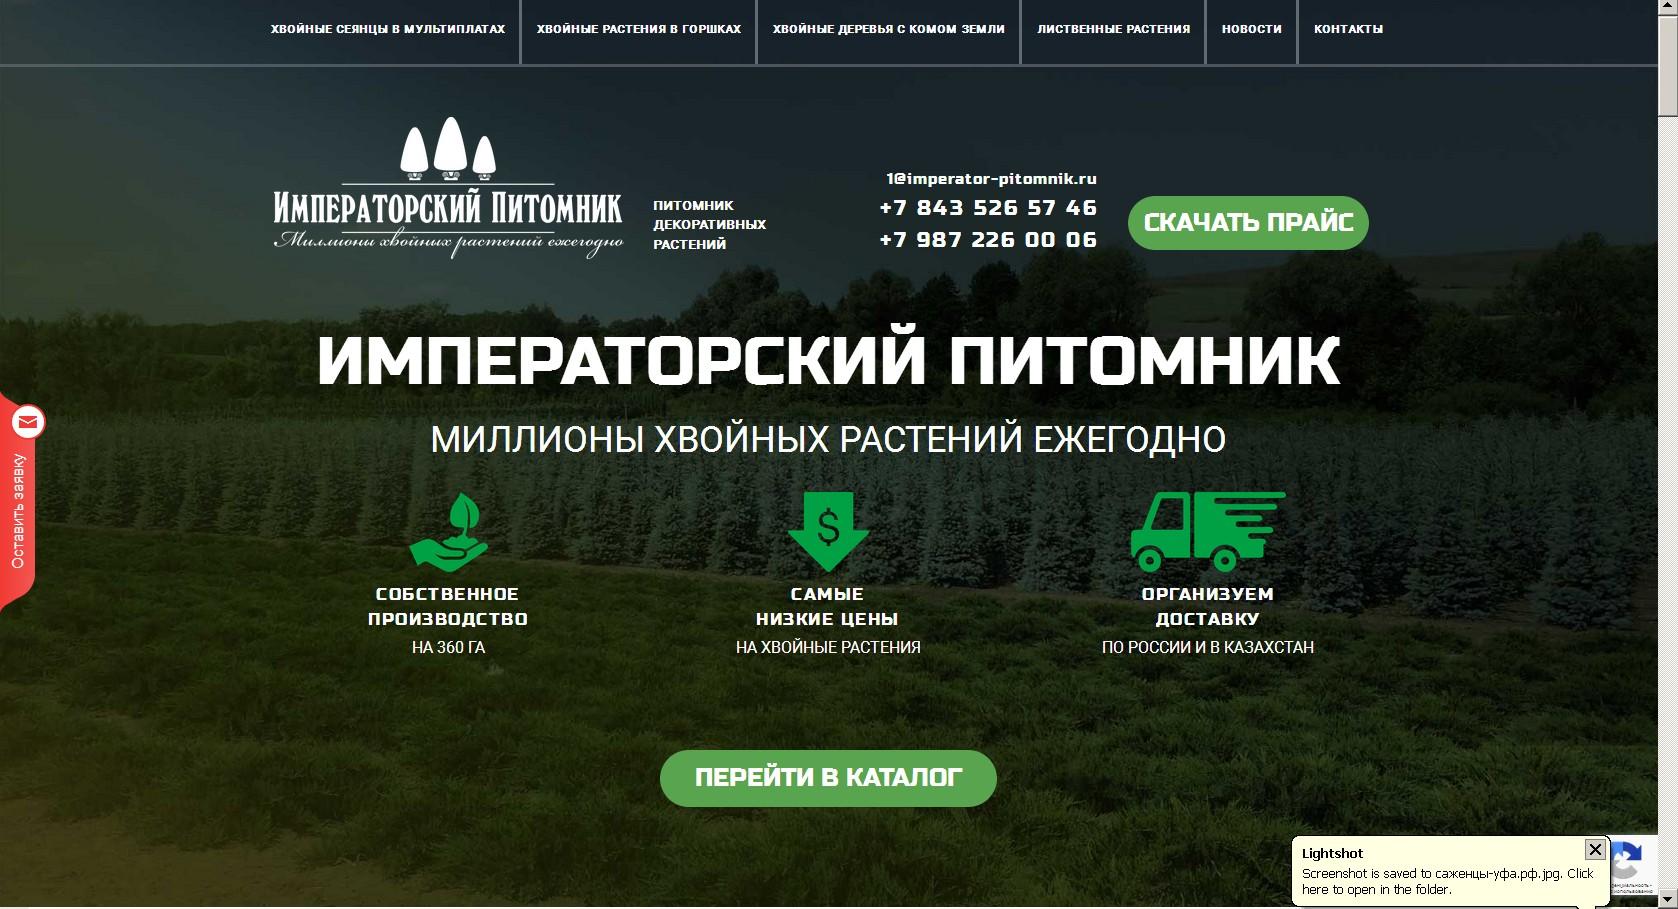 логотип imperator-pitomnik.ru